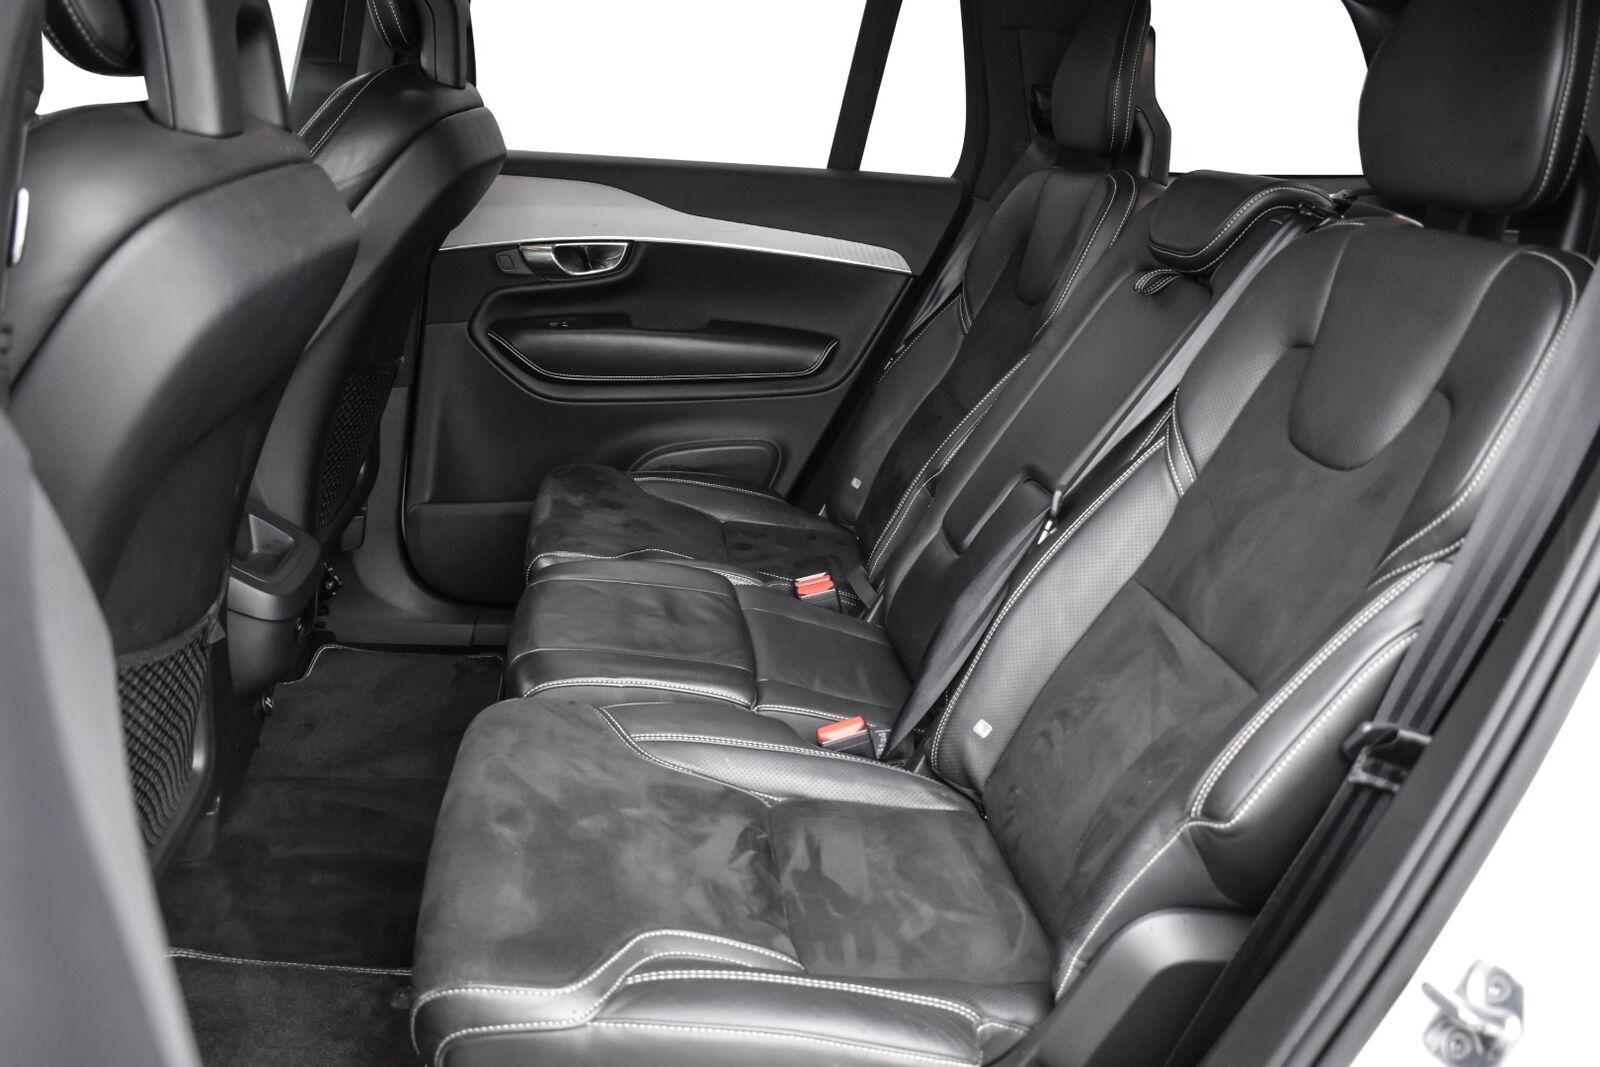 Volvo XC90 2,0 D5 225 R-Design aut. AWD 7prs - billede 7